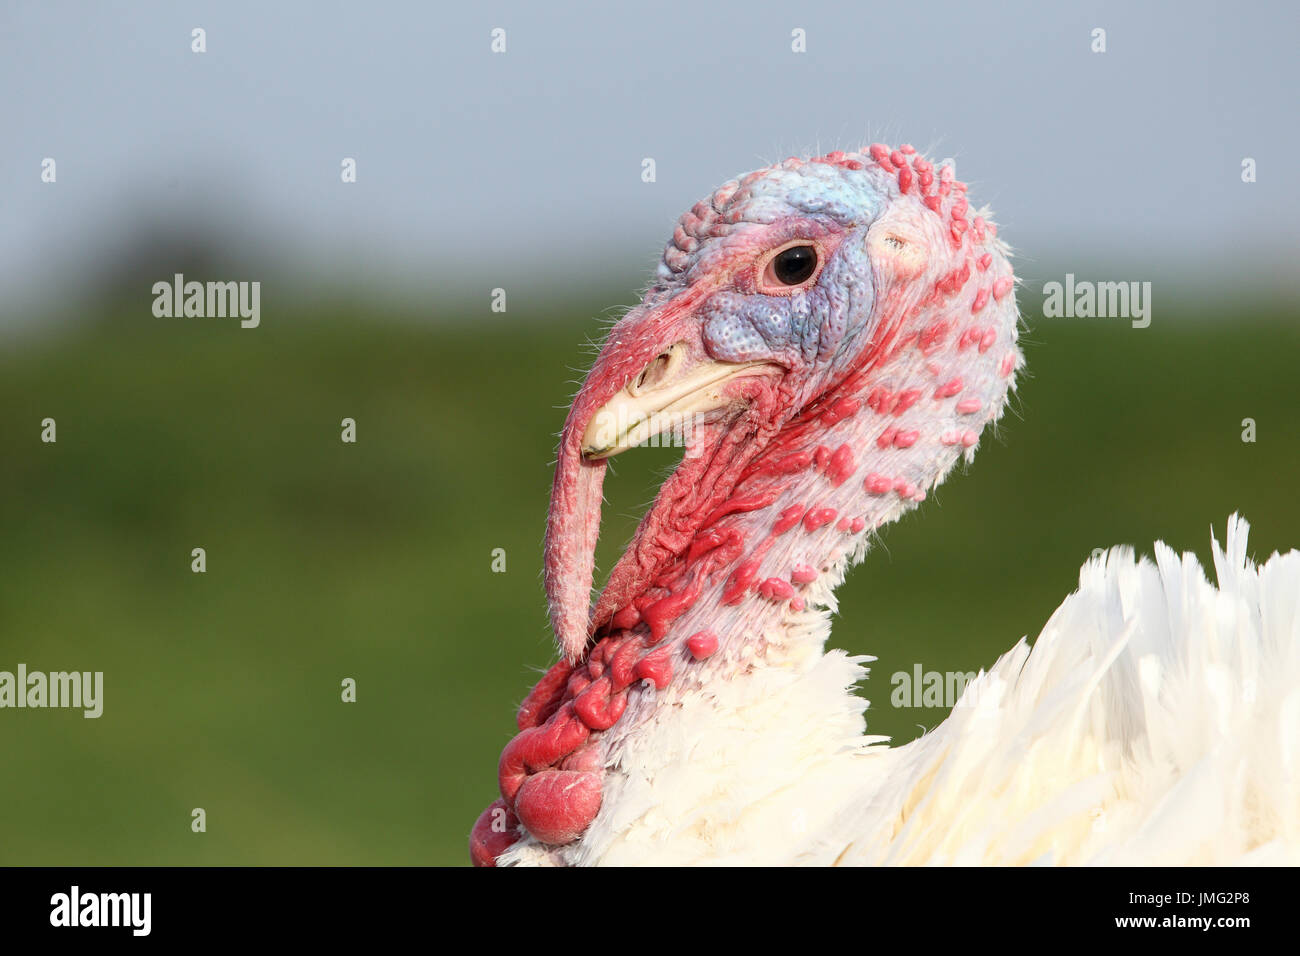 Domestic turkey. Portrait of white farm turkey. France - Stock Image